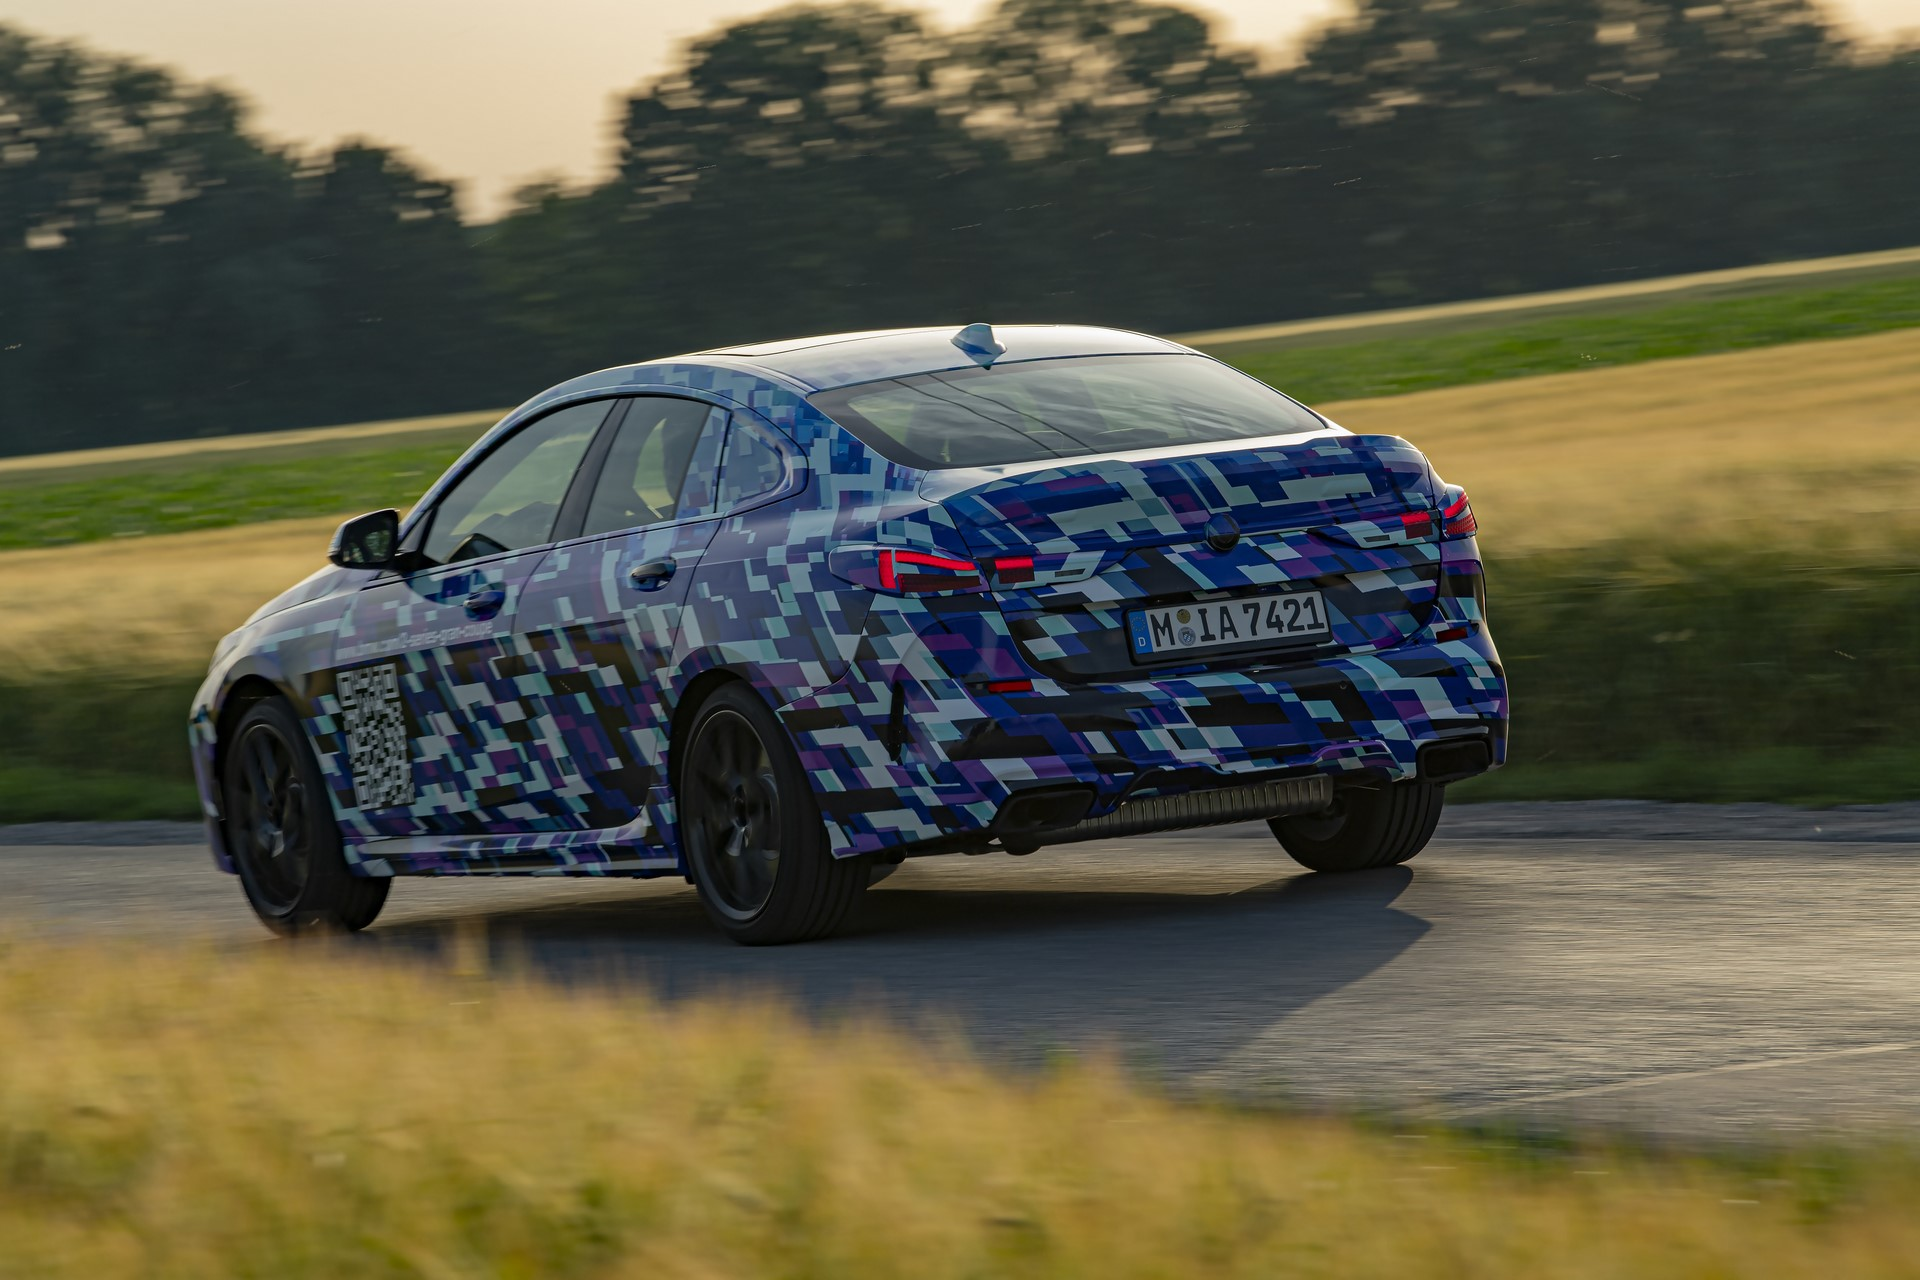 BMW-2-Series-Gran-Coupe-2020-spy-photos-17